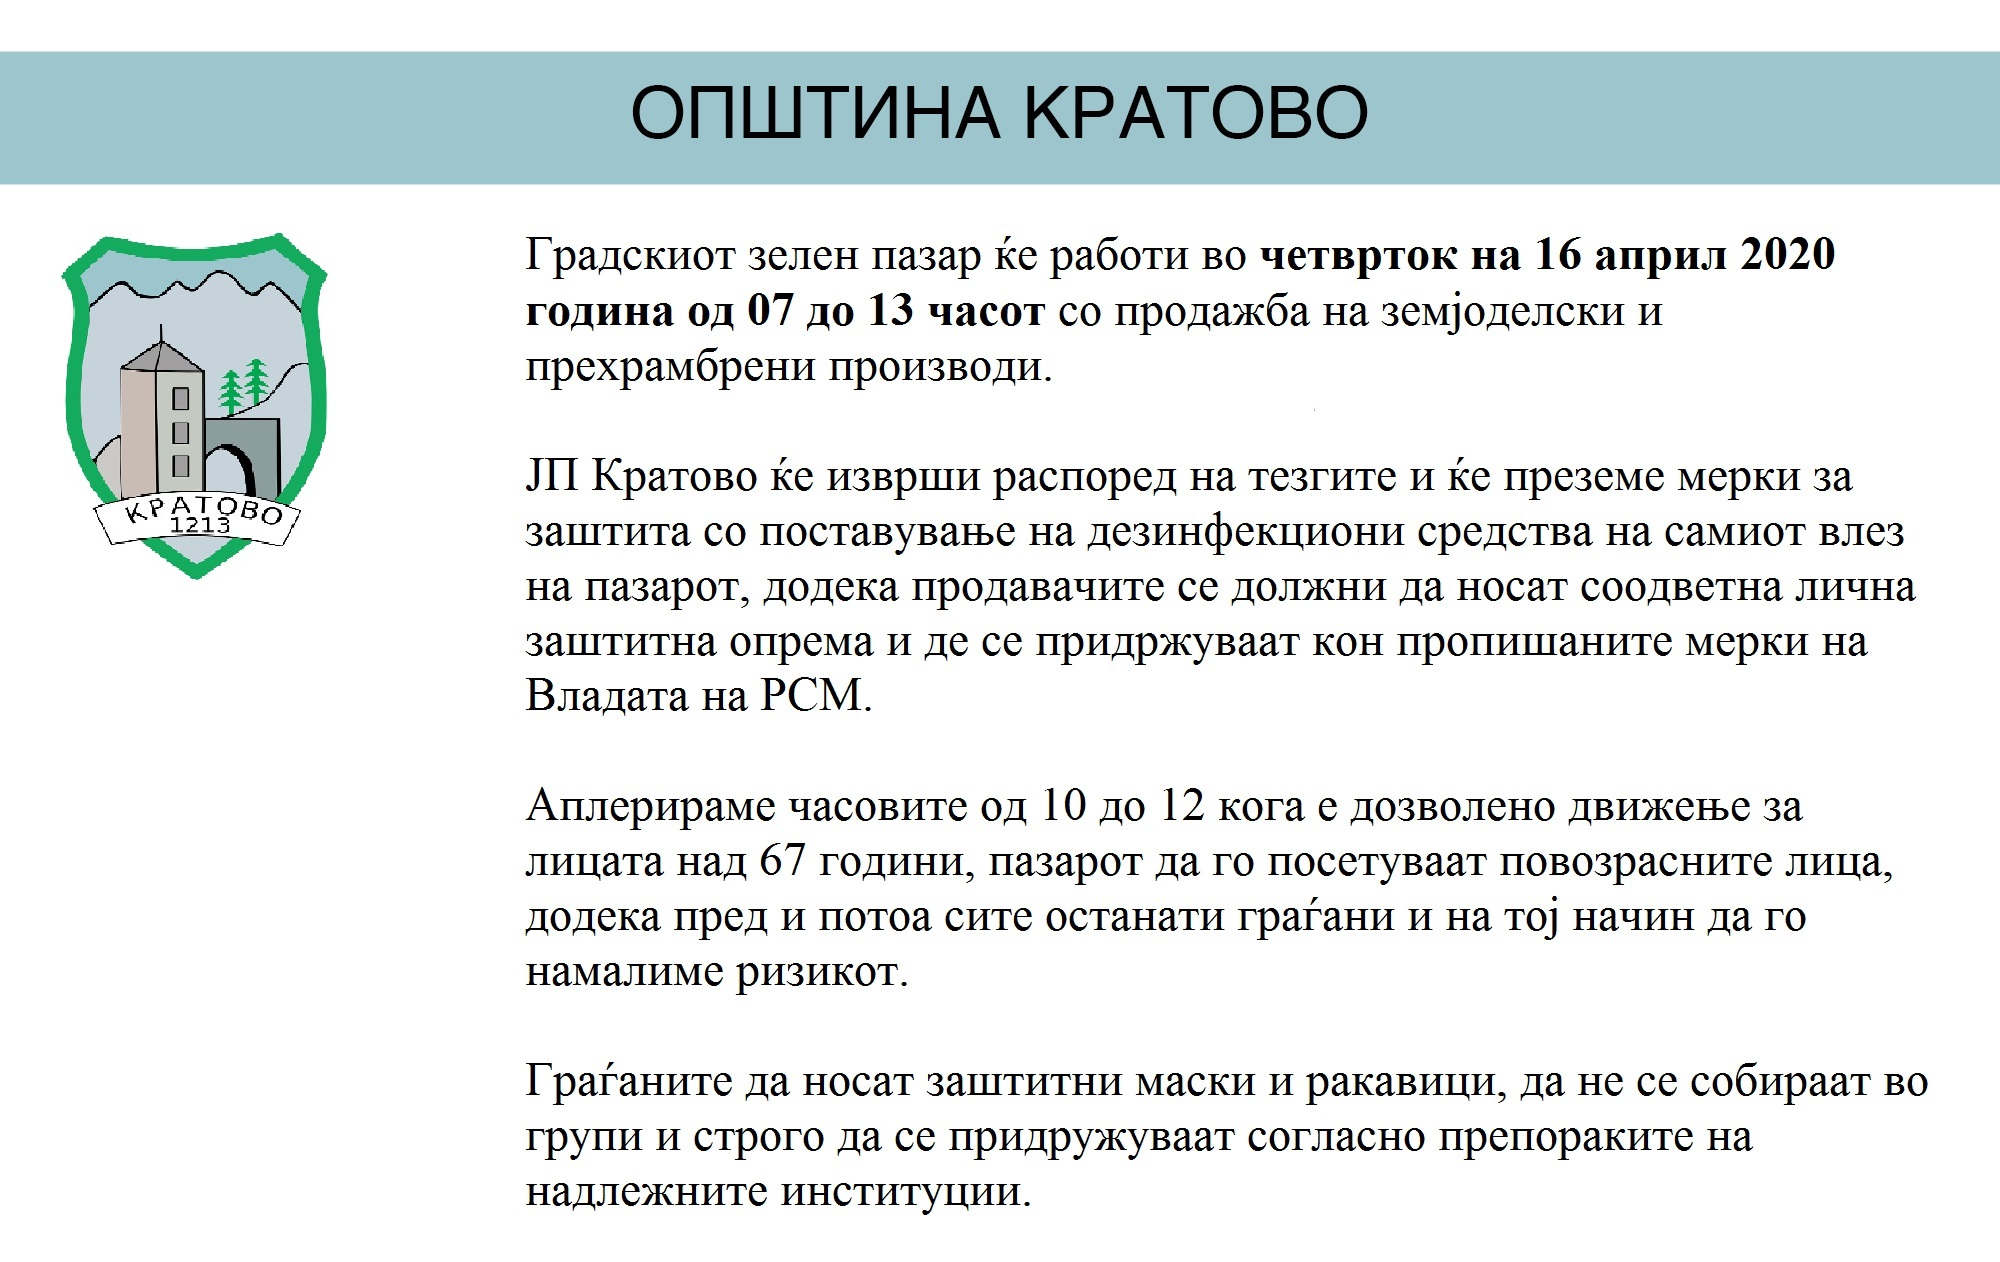 KRATOVO 22